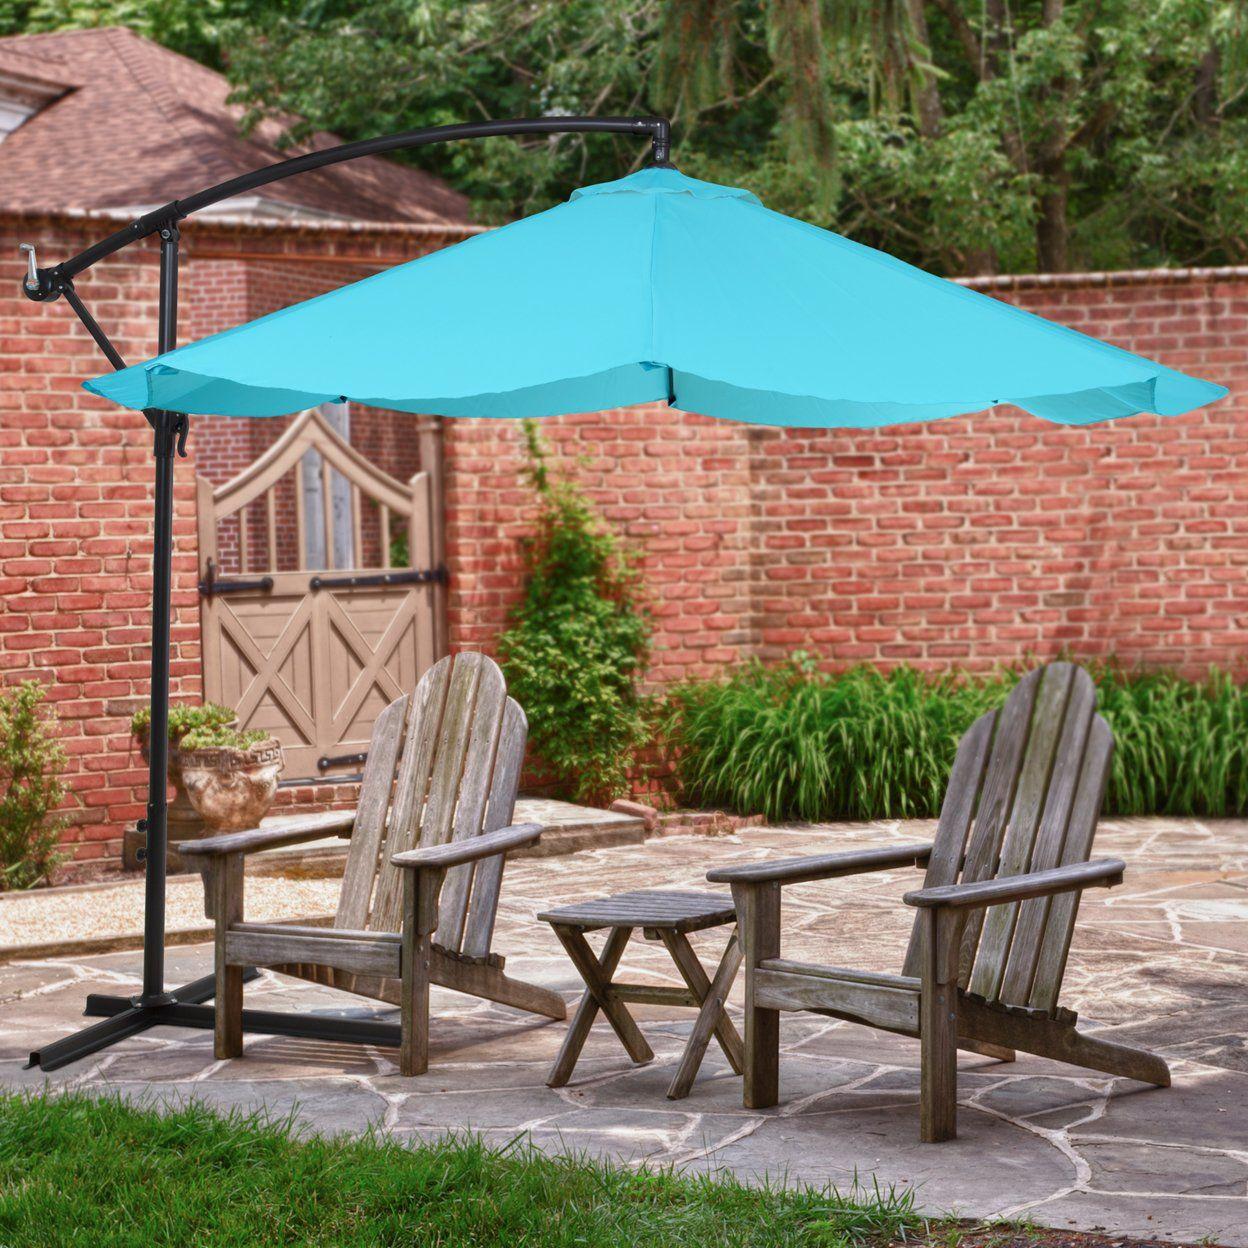 Pure Garden Offset 10 Foot Aluminum Hanging Patio Umbrella